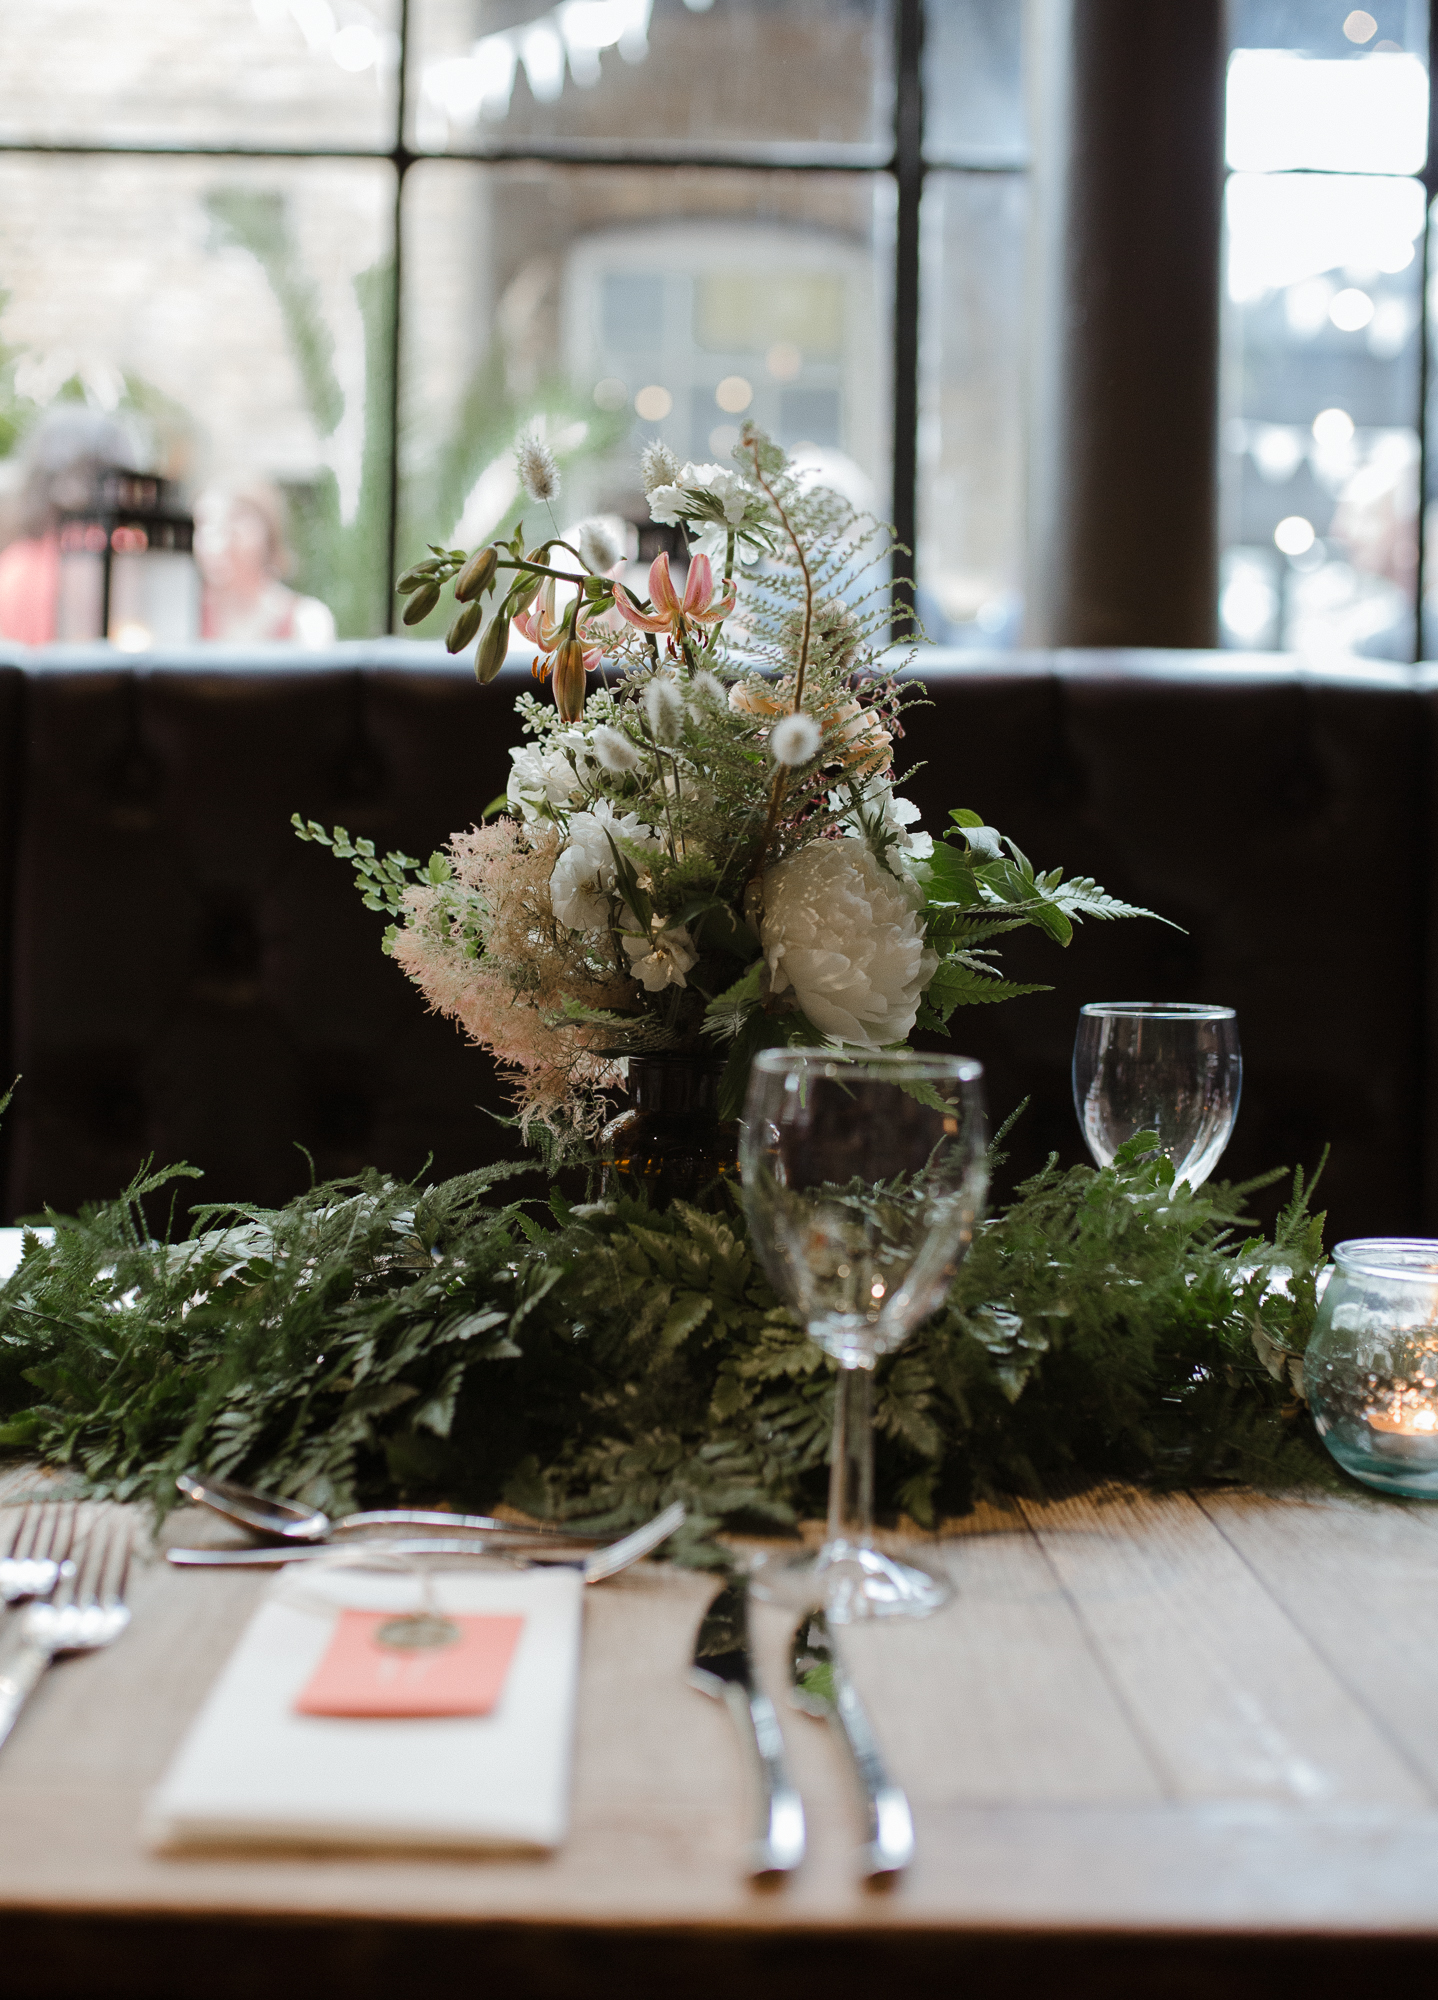 Nicebunch wedding flowers sula london-islington-town-hall-depot-n7 ethical british luxury bottles ferns stephanie-green-wedding-photography4